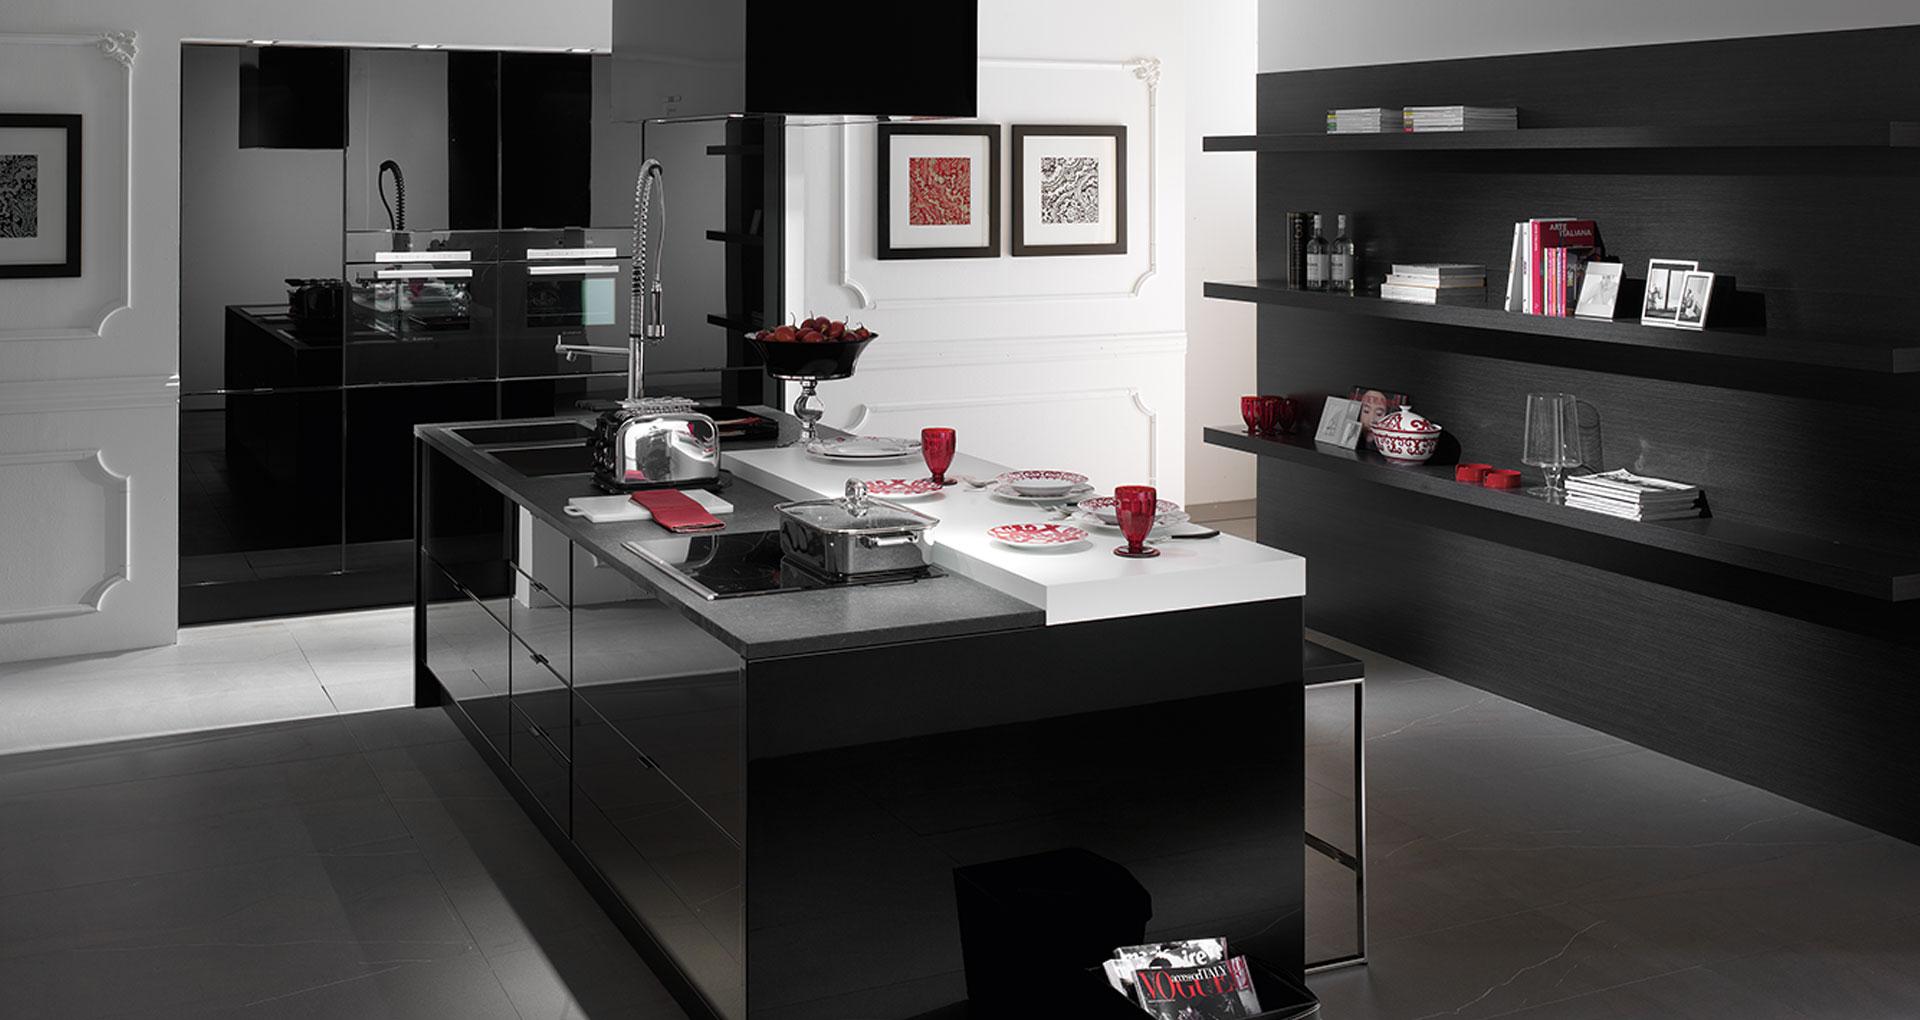 Le cucine italiane stunning cucine migliori cucine - Cucine famose marche ...